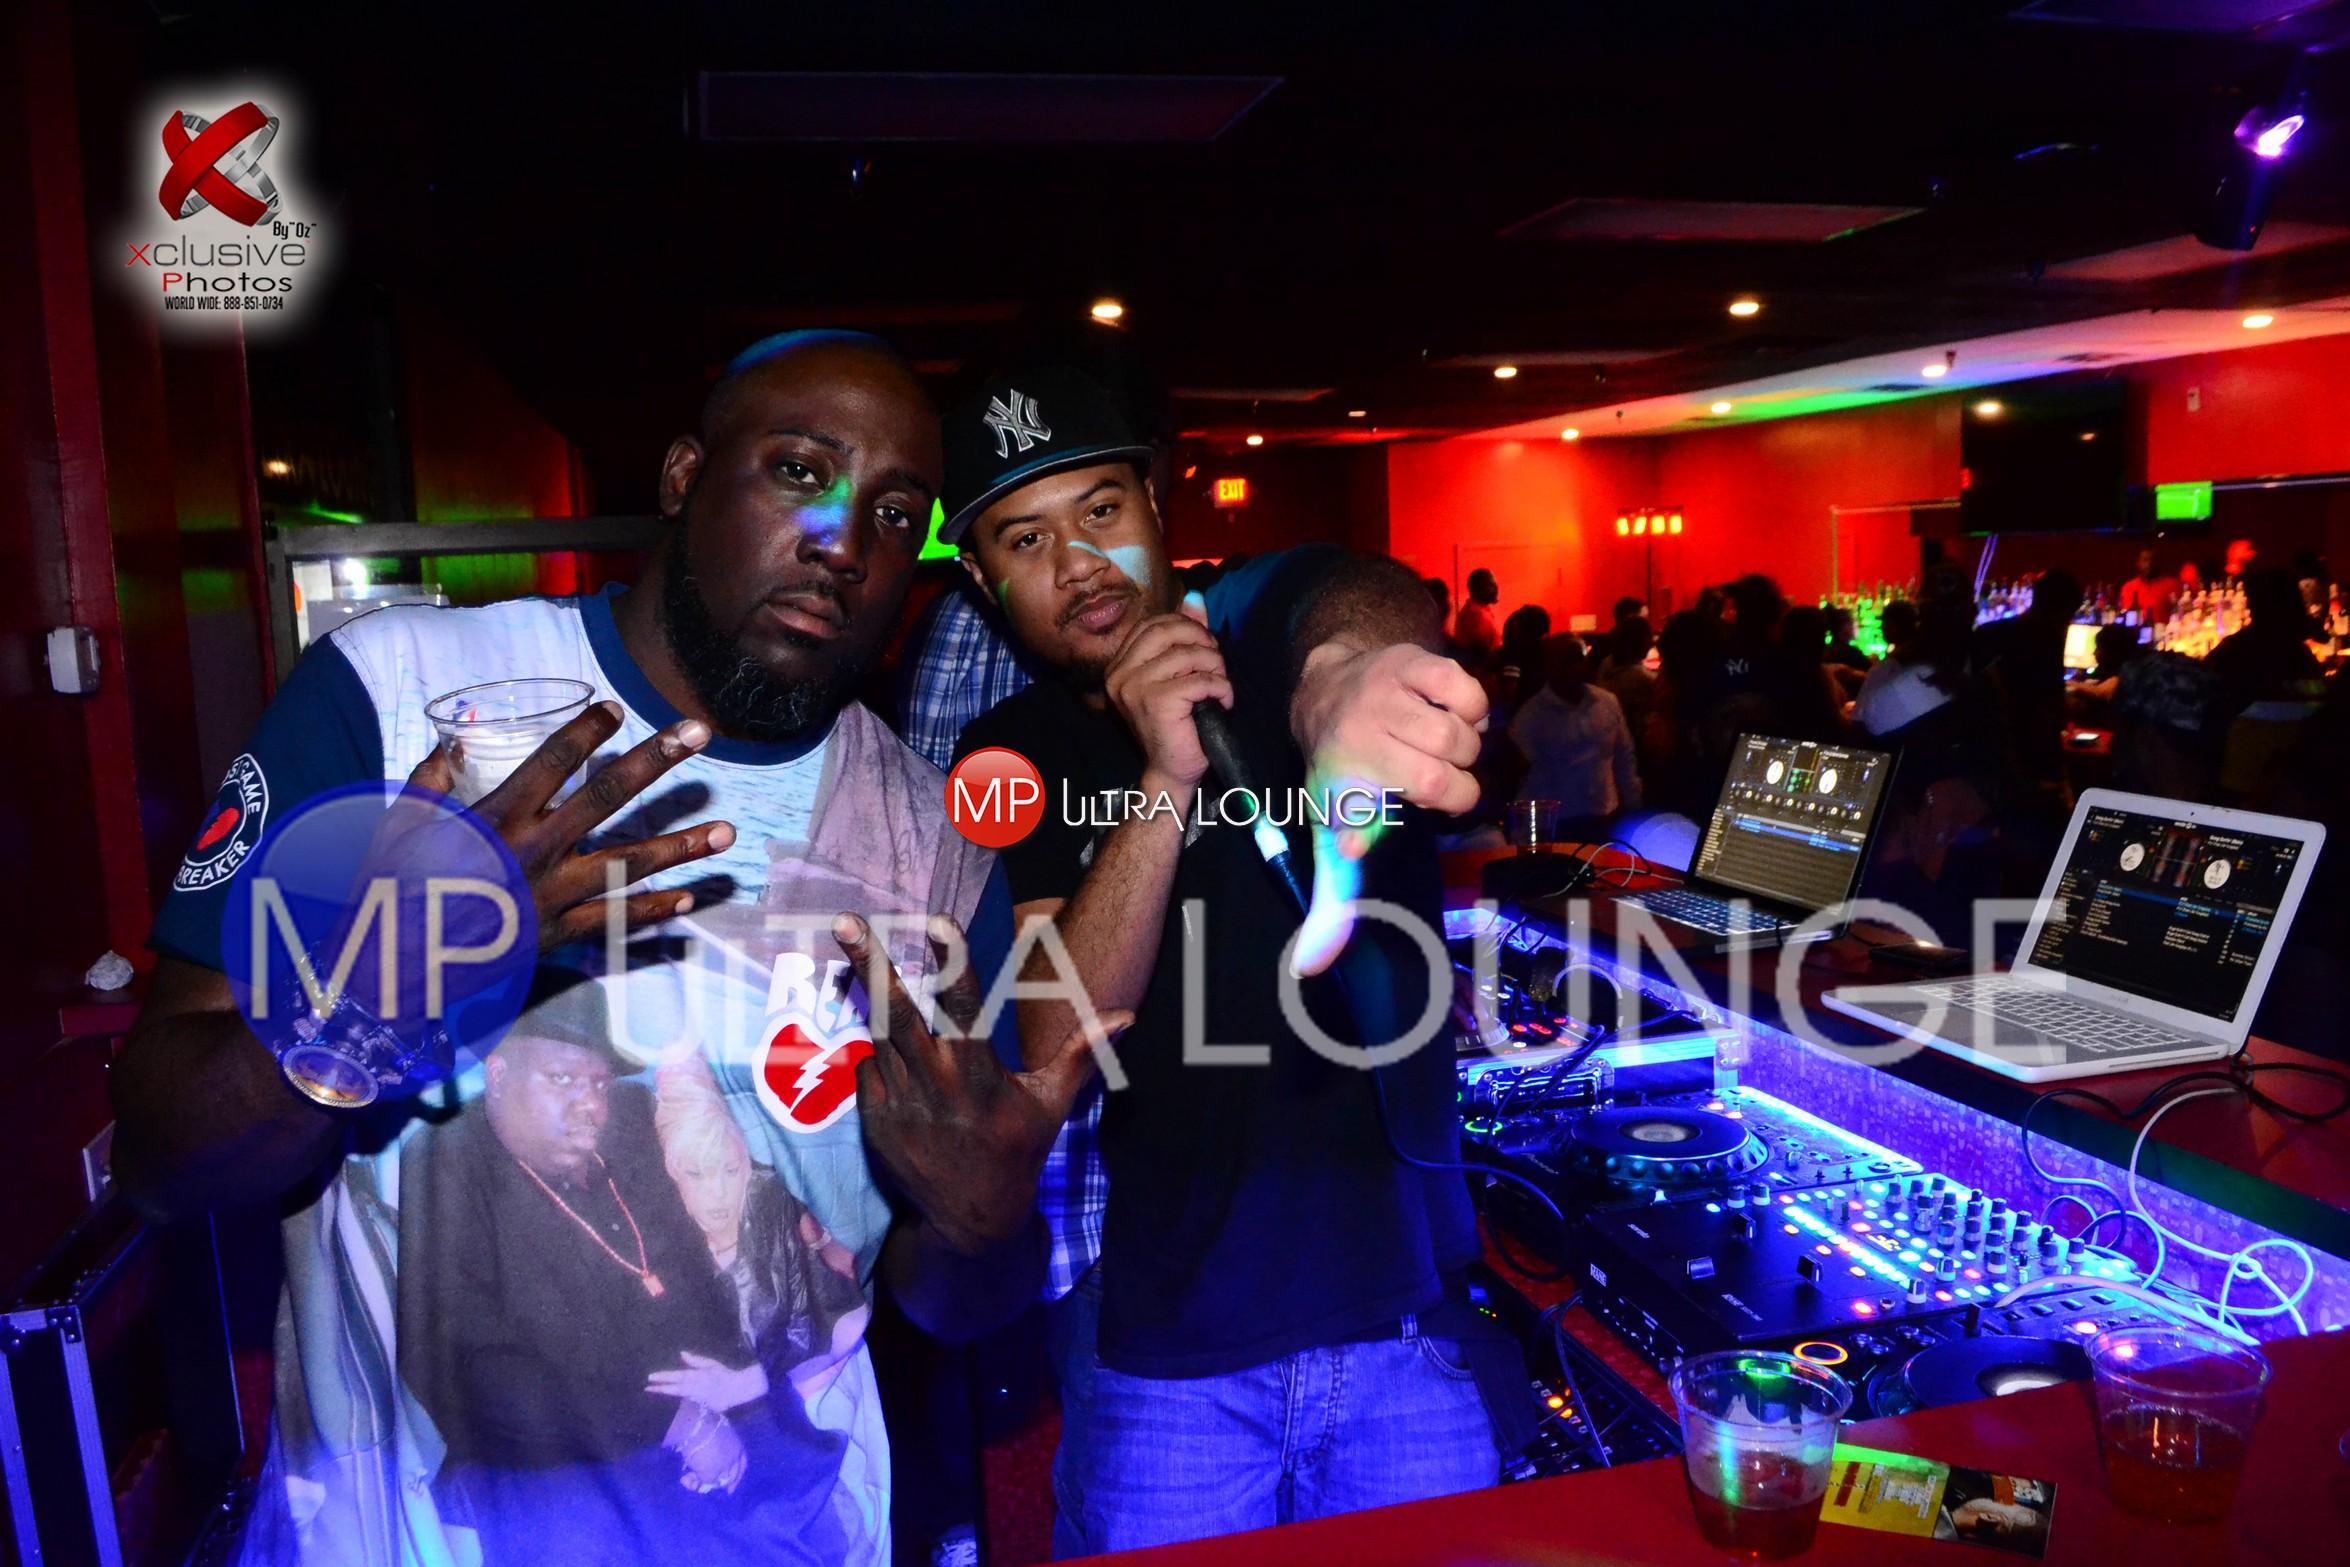 Party Photos Mp Ultra Lounge